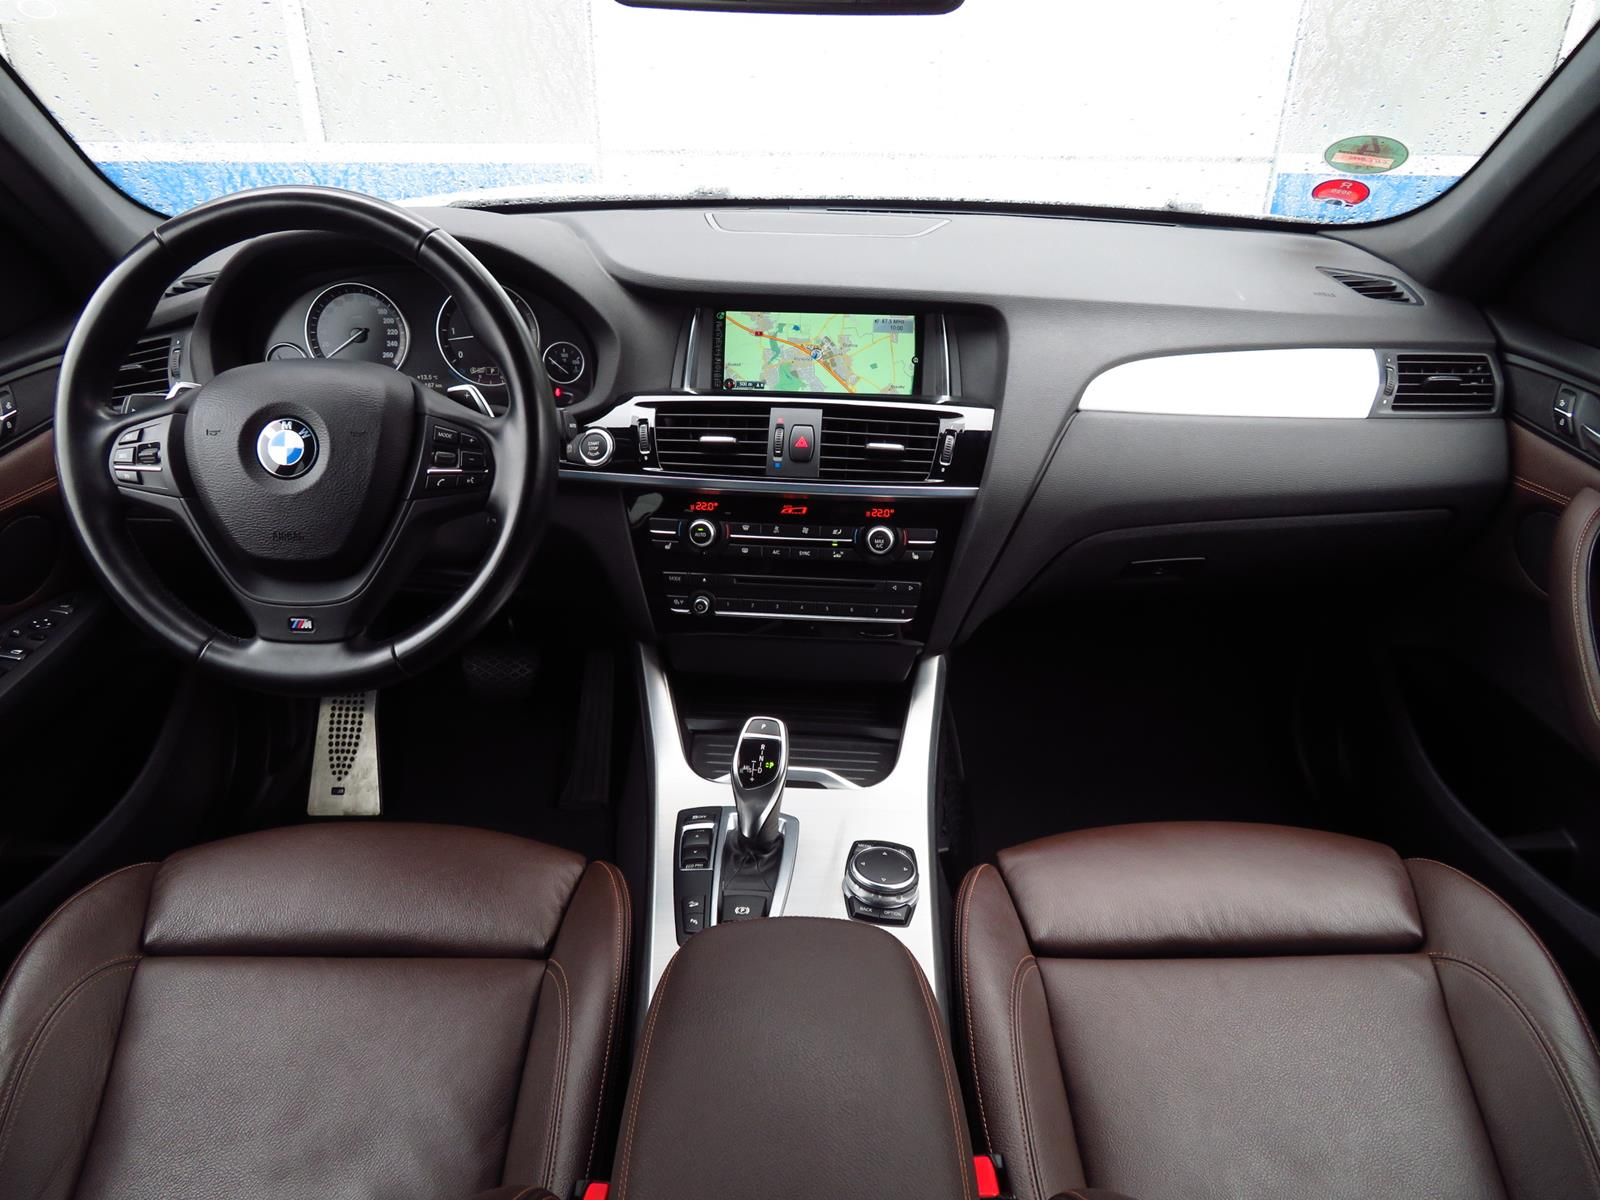 Gebrauchte Bmw X3 2016 Xdrive30d 107256km Suv 2016 Aaa Auto Export